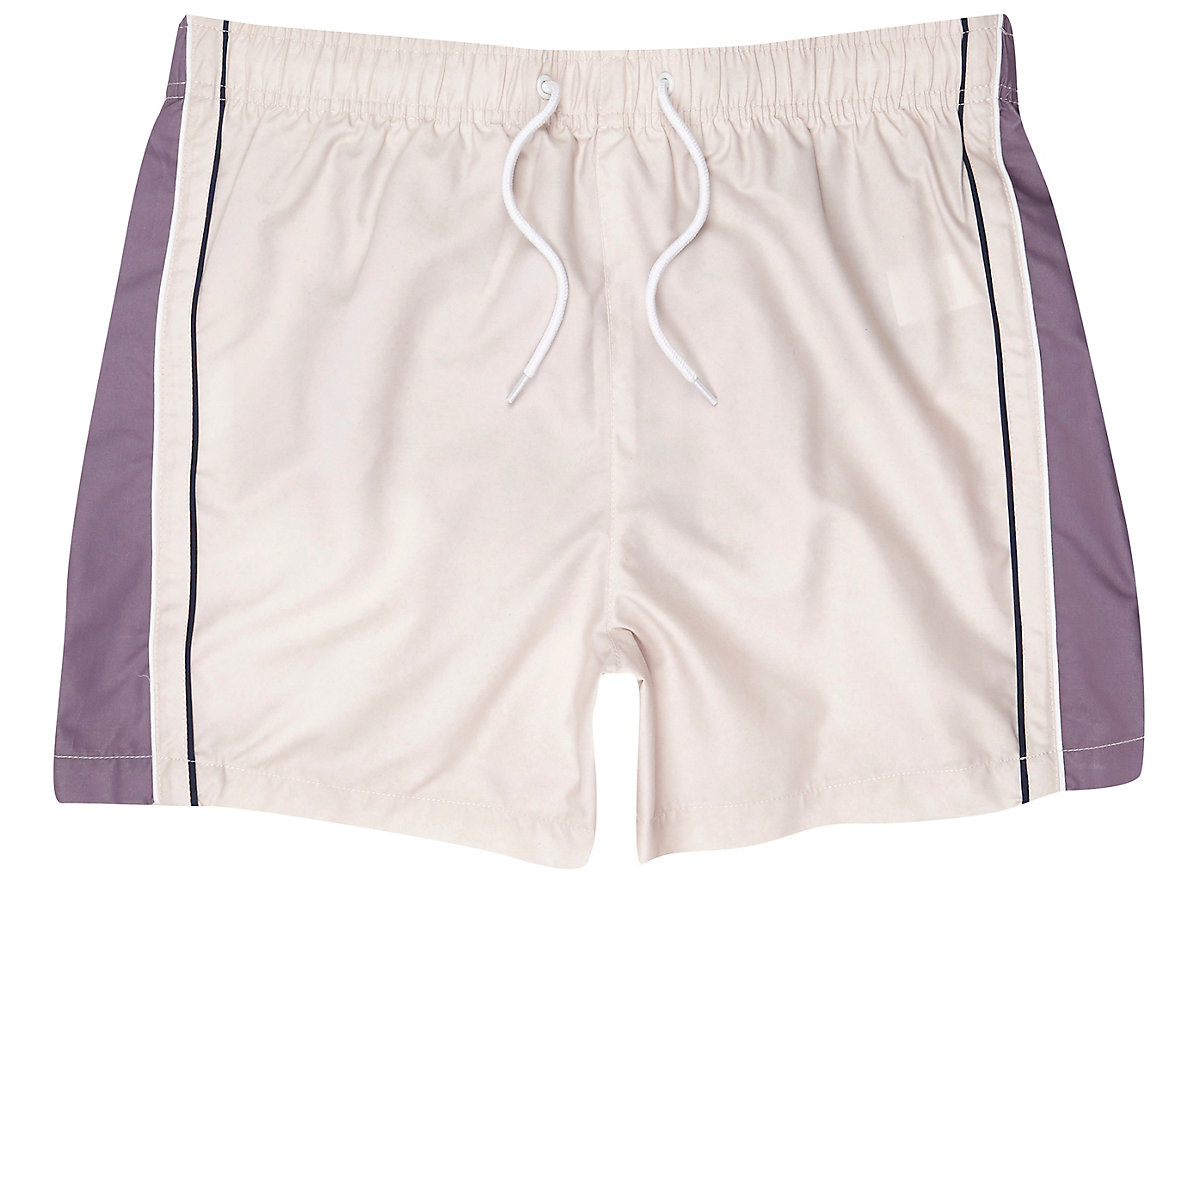 Light pink blocked stripe swim trunks